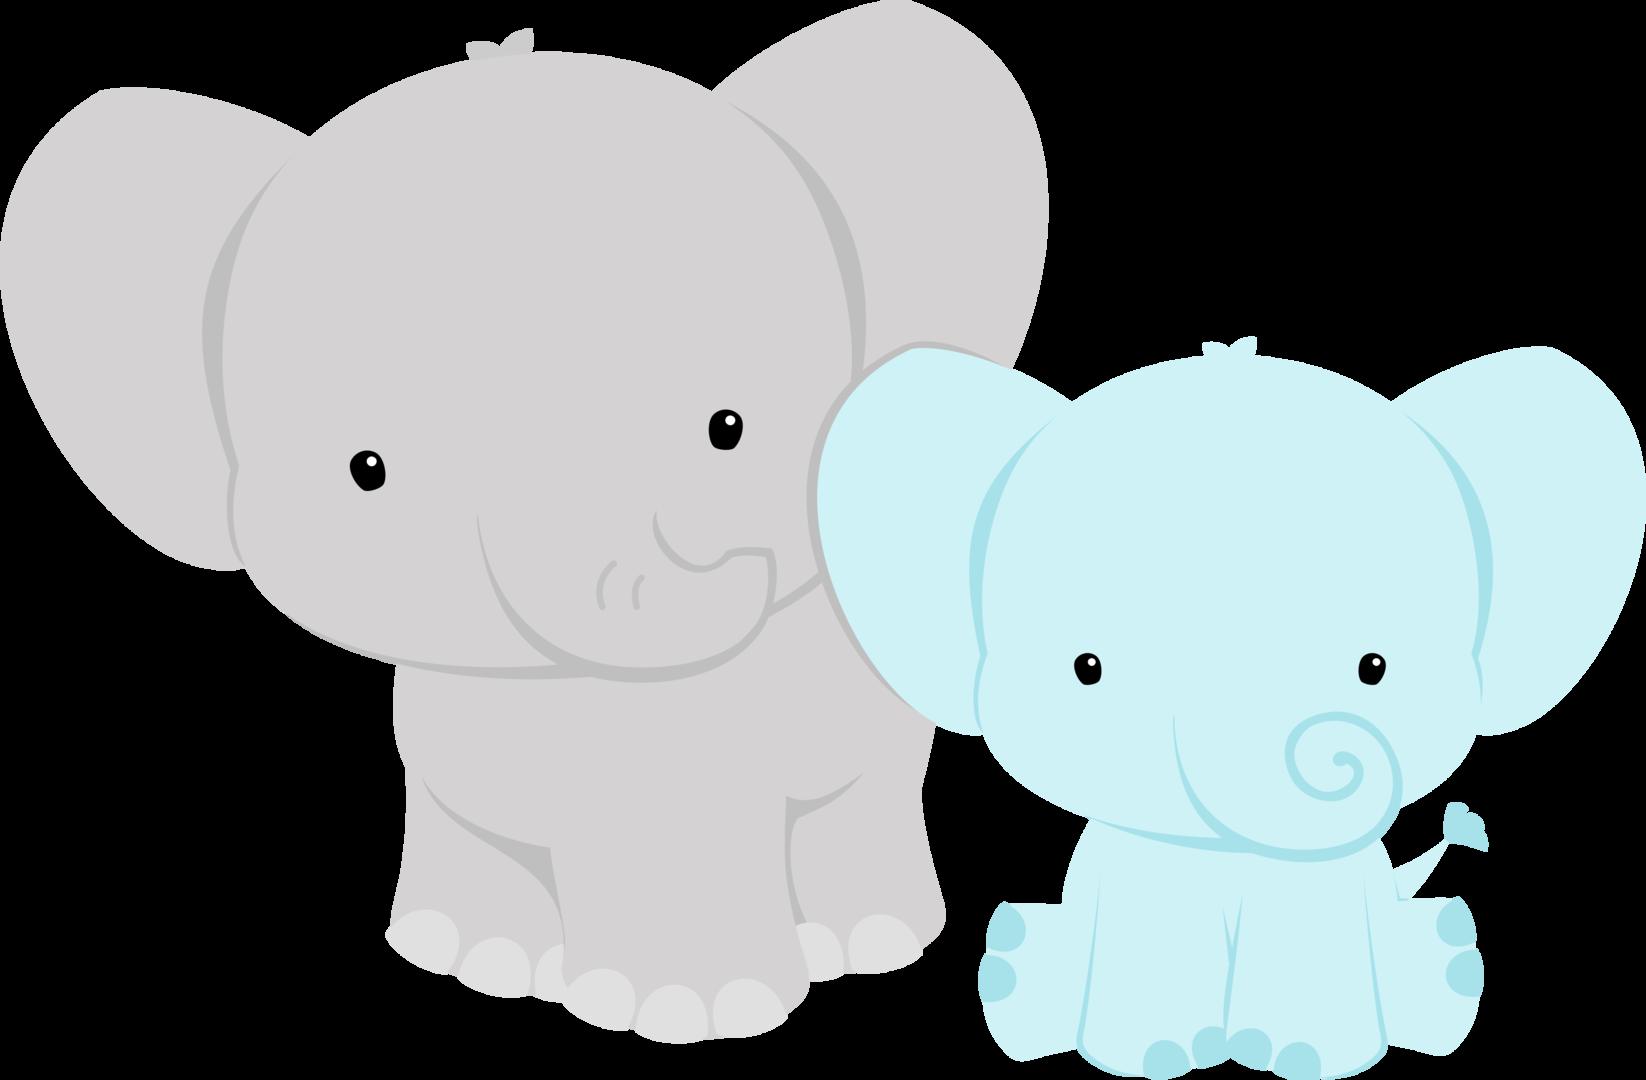 4shared Ver Todas Las Imagenes De La Carpeta Png Elefantes